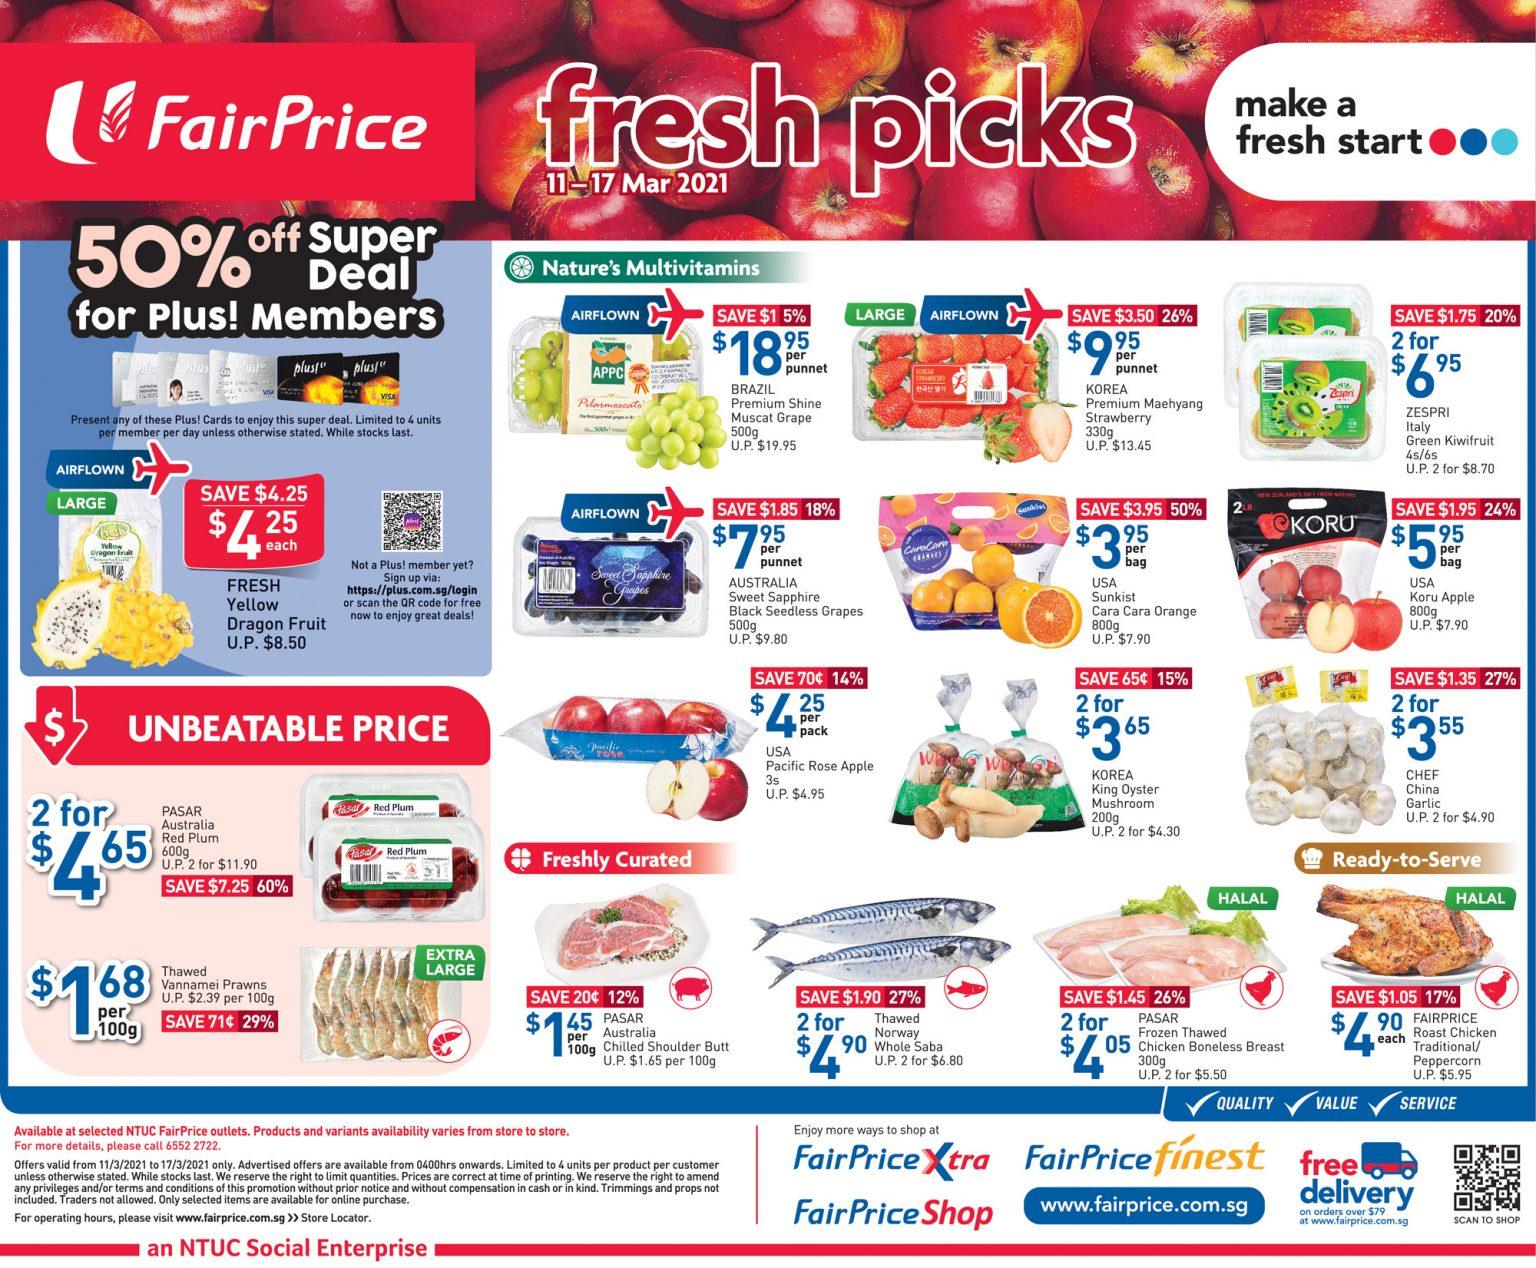 Fresh picks at FairPrice till 17 March 2021